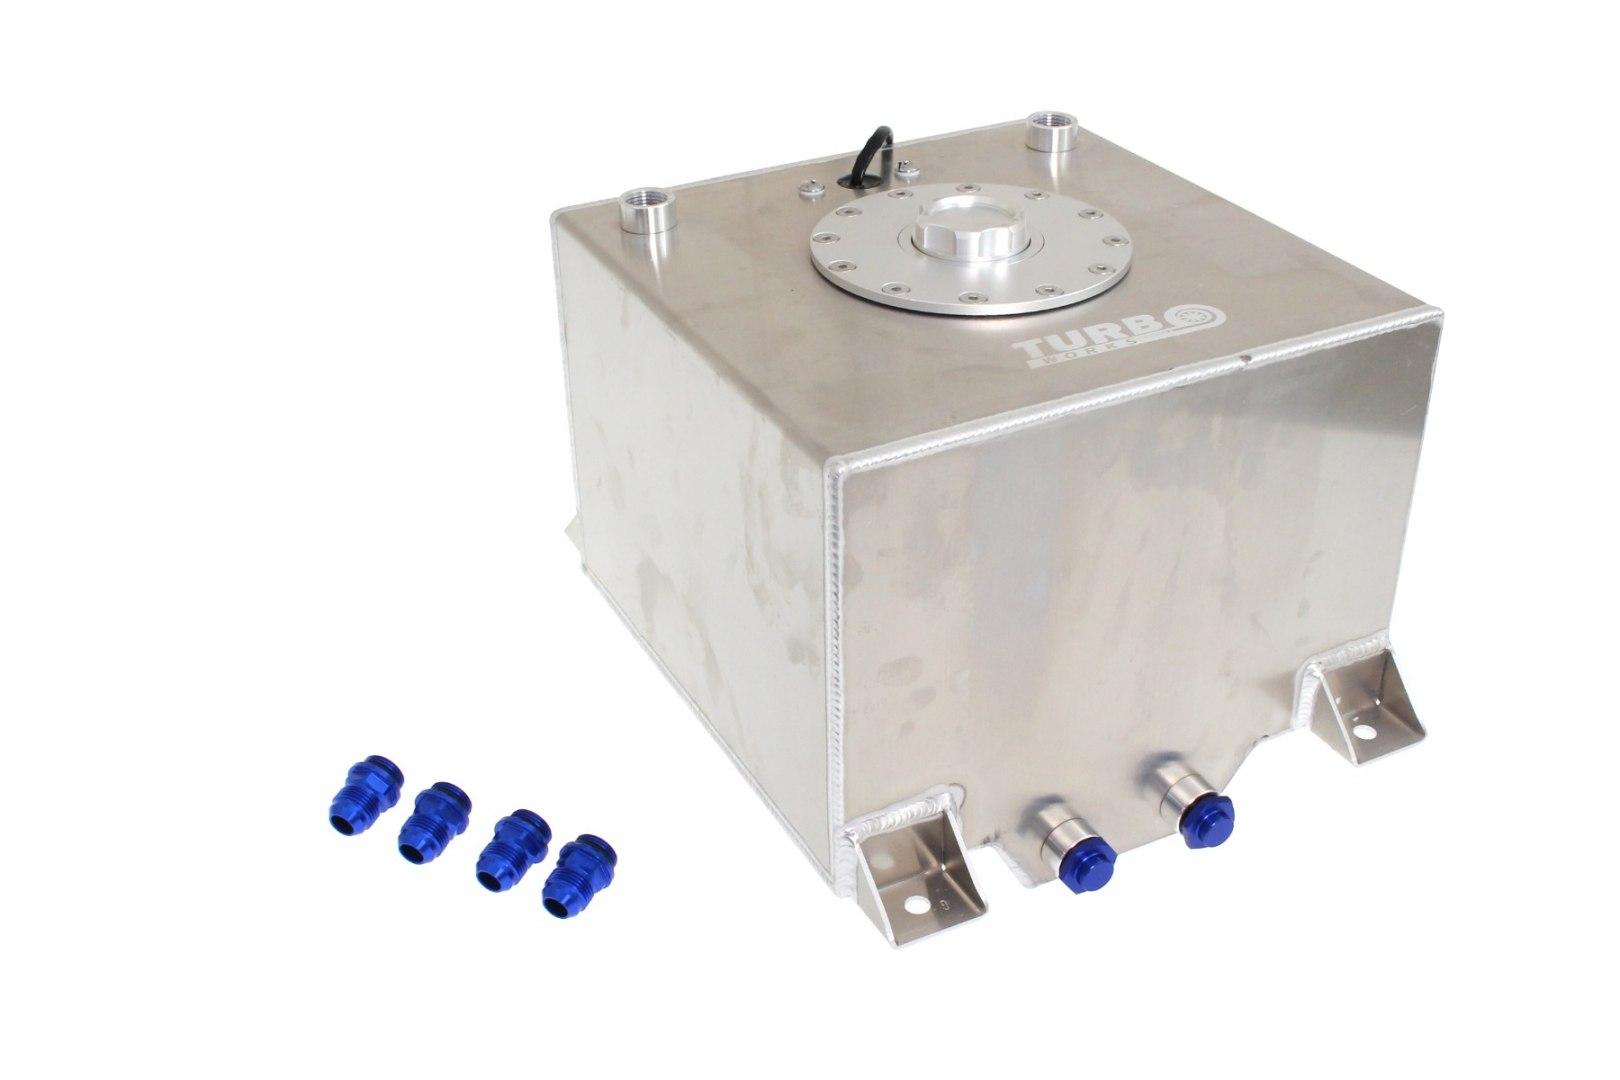 Zbiornik Paliwa Aluminiowy TurboWorks 40L - GRUBYGARAGE - Sklep Tuningowy